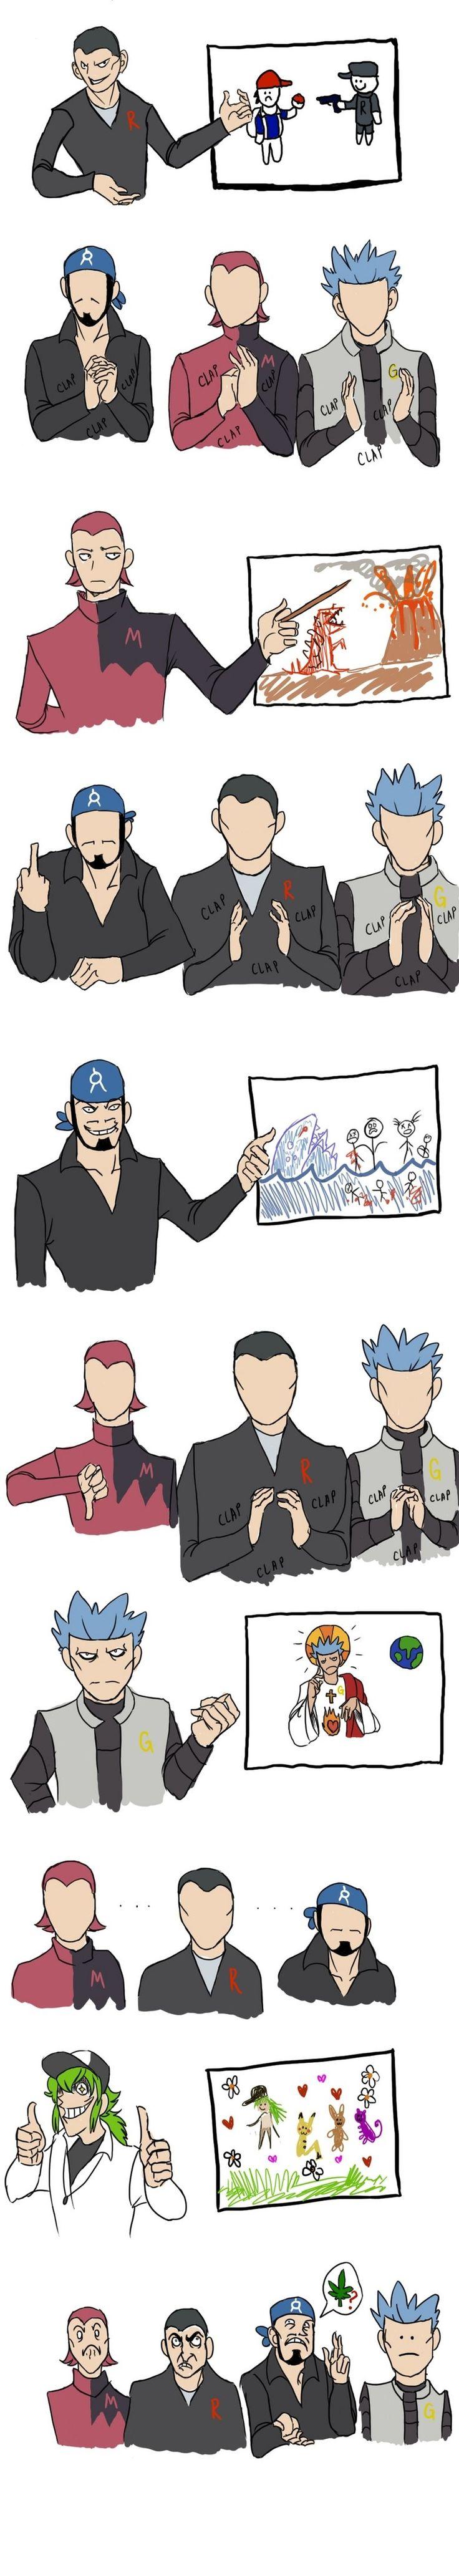 On the theory of Pokemon villains.